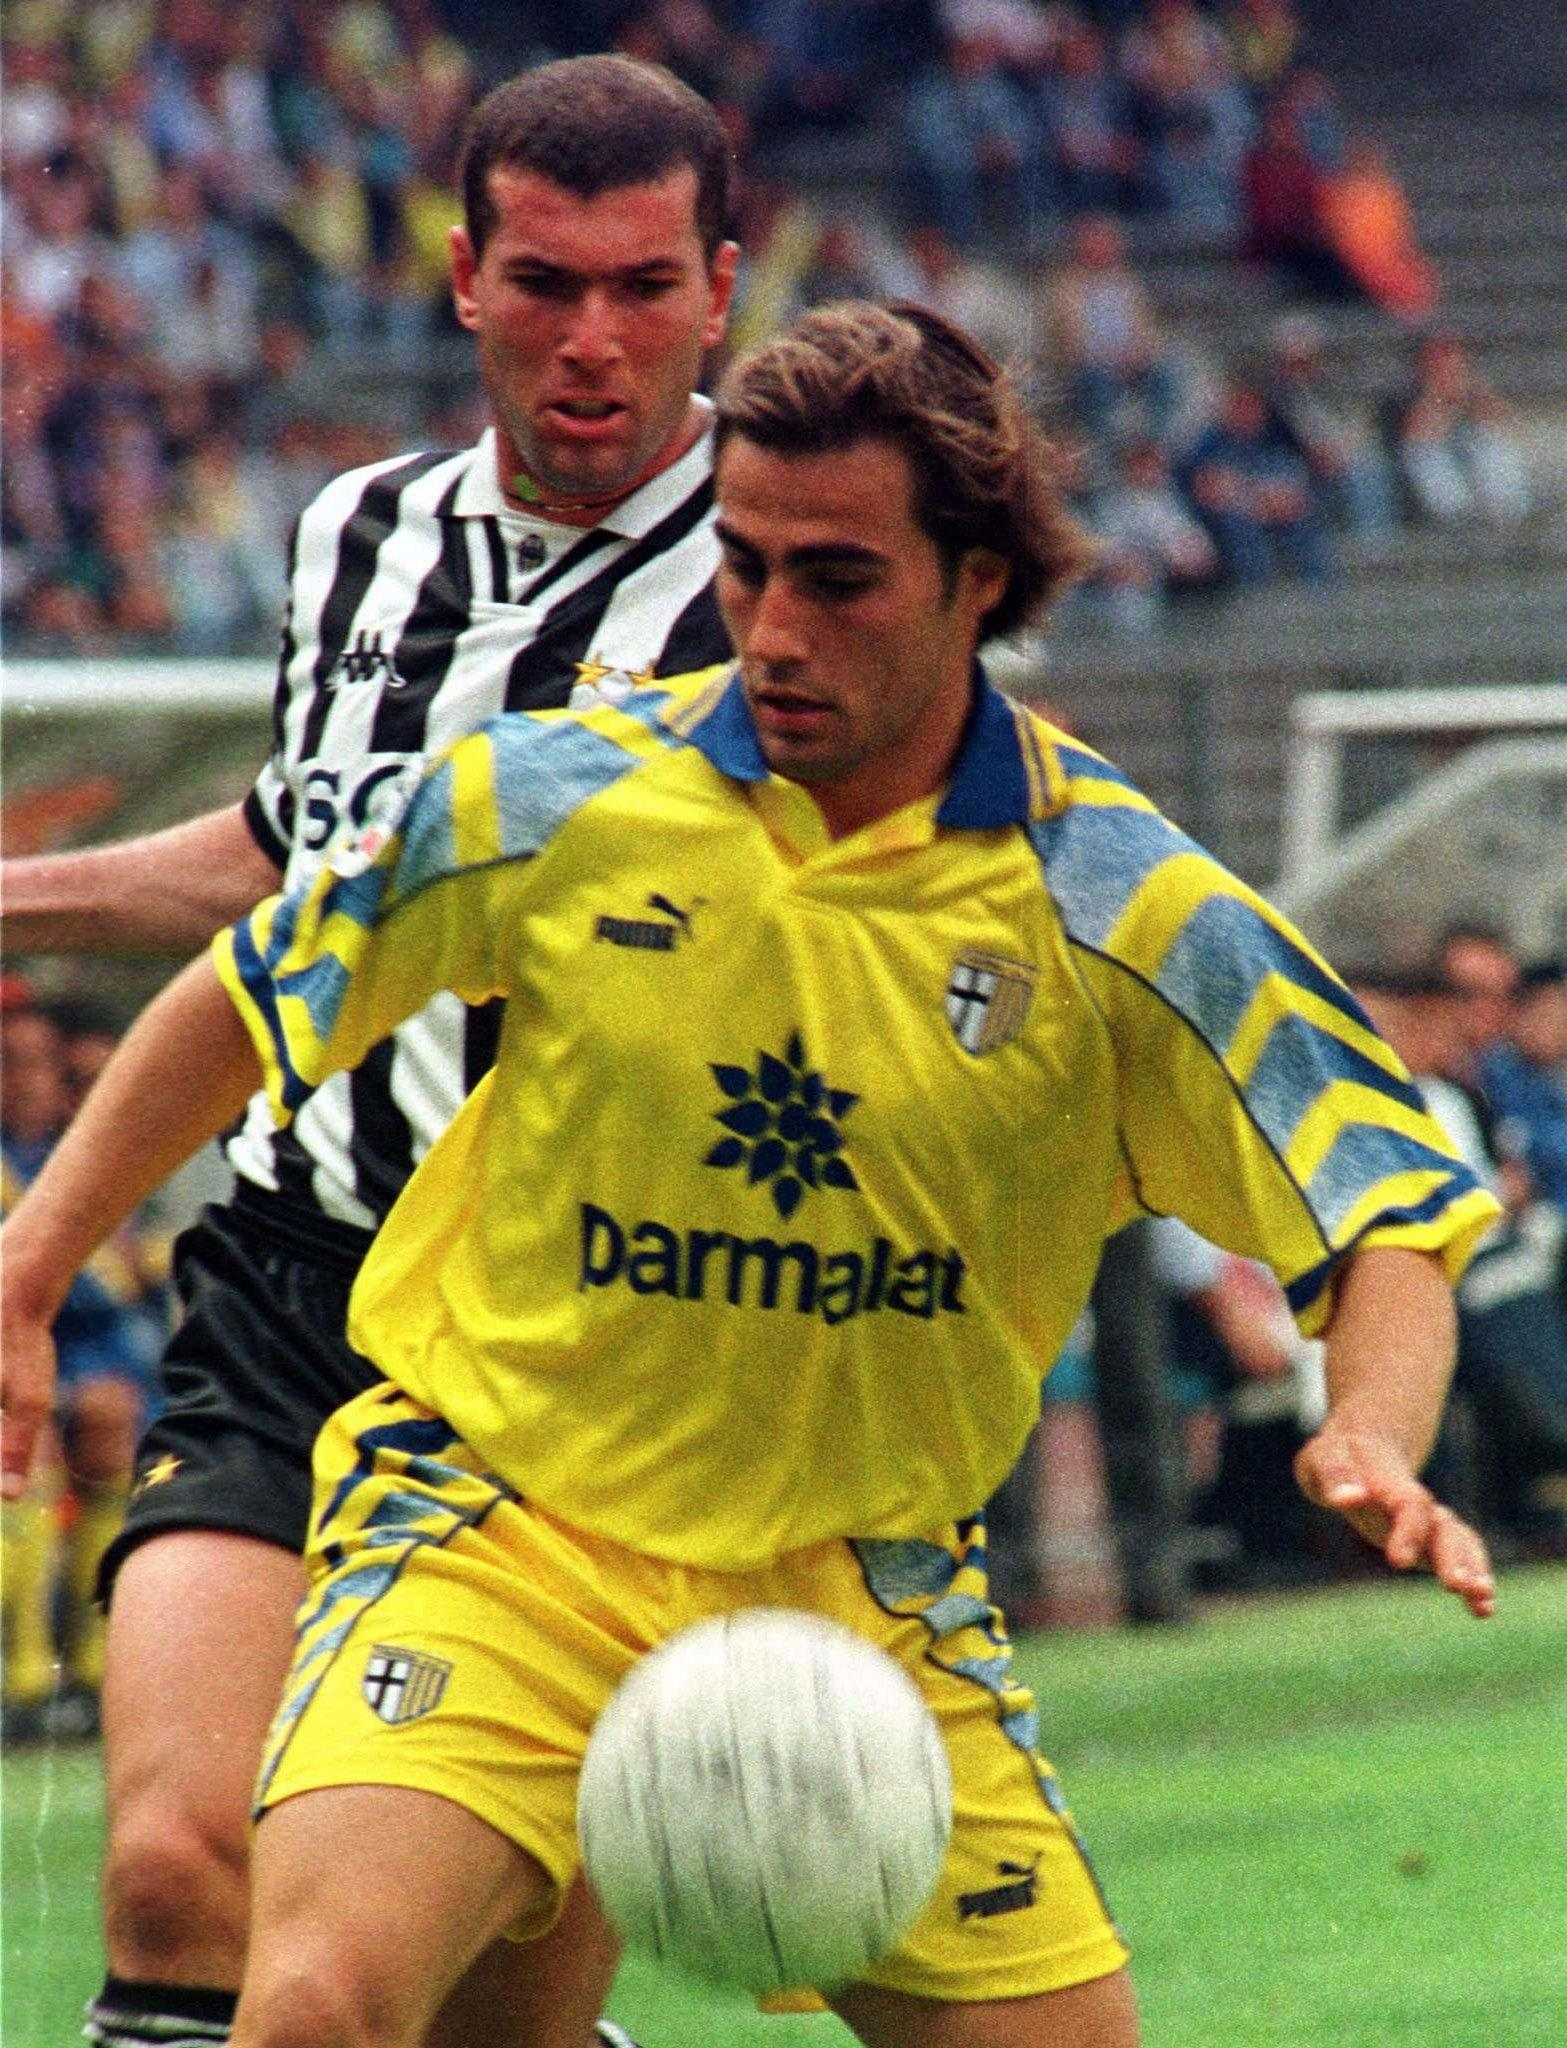 hot sale online b9a27 00294 File:Serie A 1996-97 - Juventus vs Parma - Fabio Cannavaro e ...